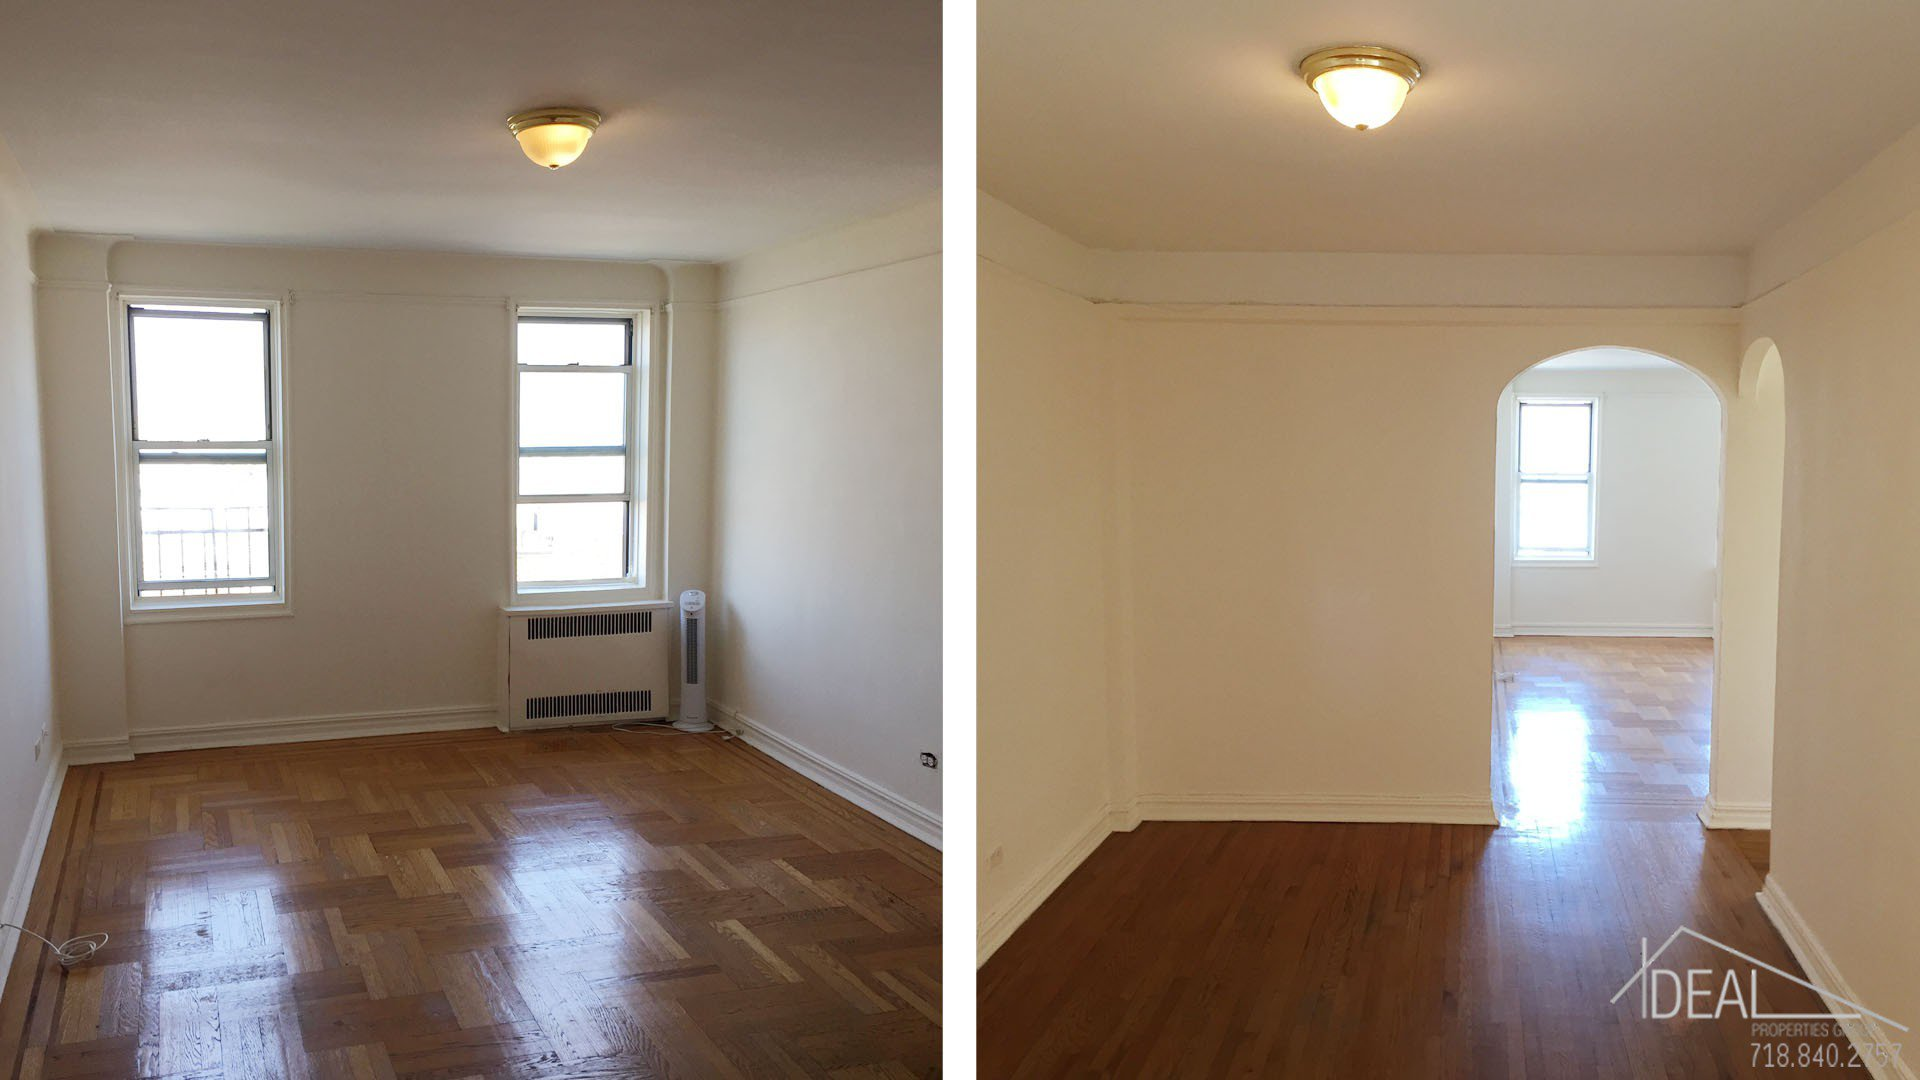 2 Bedroom Apartments For Rent In Bay Ridge Brooklyn 28 Images Brooklyn Apartments For Rent